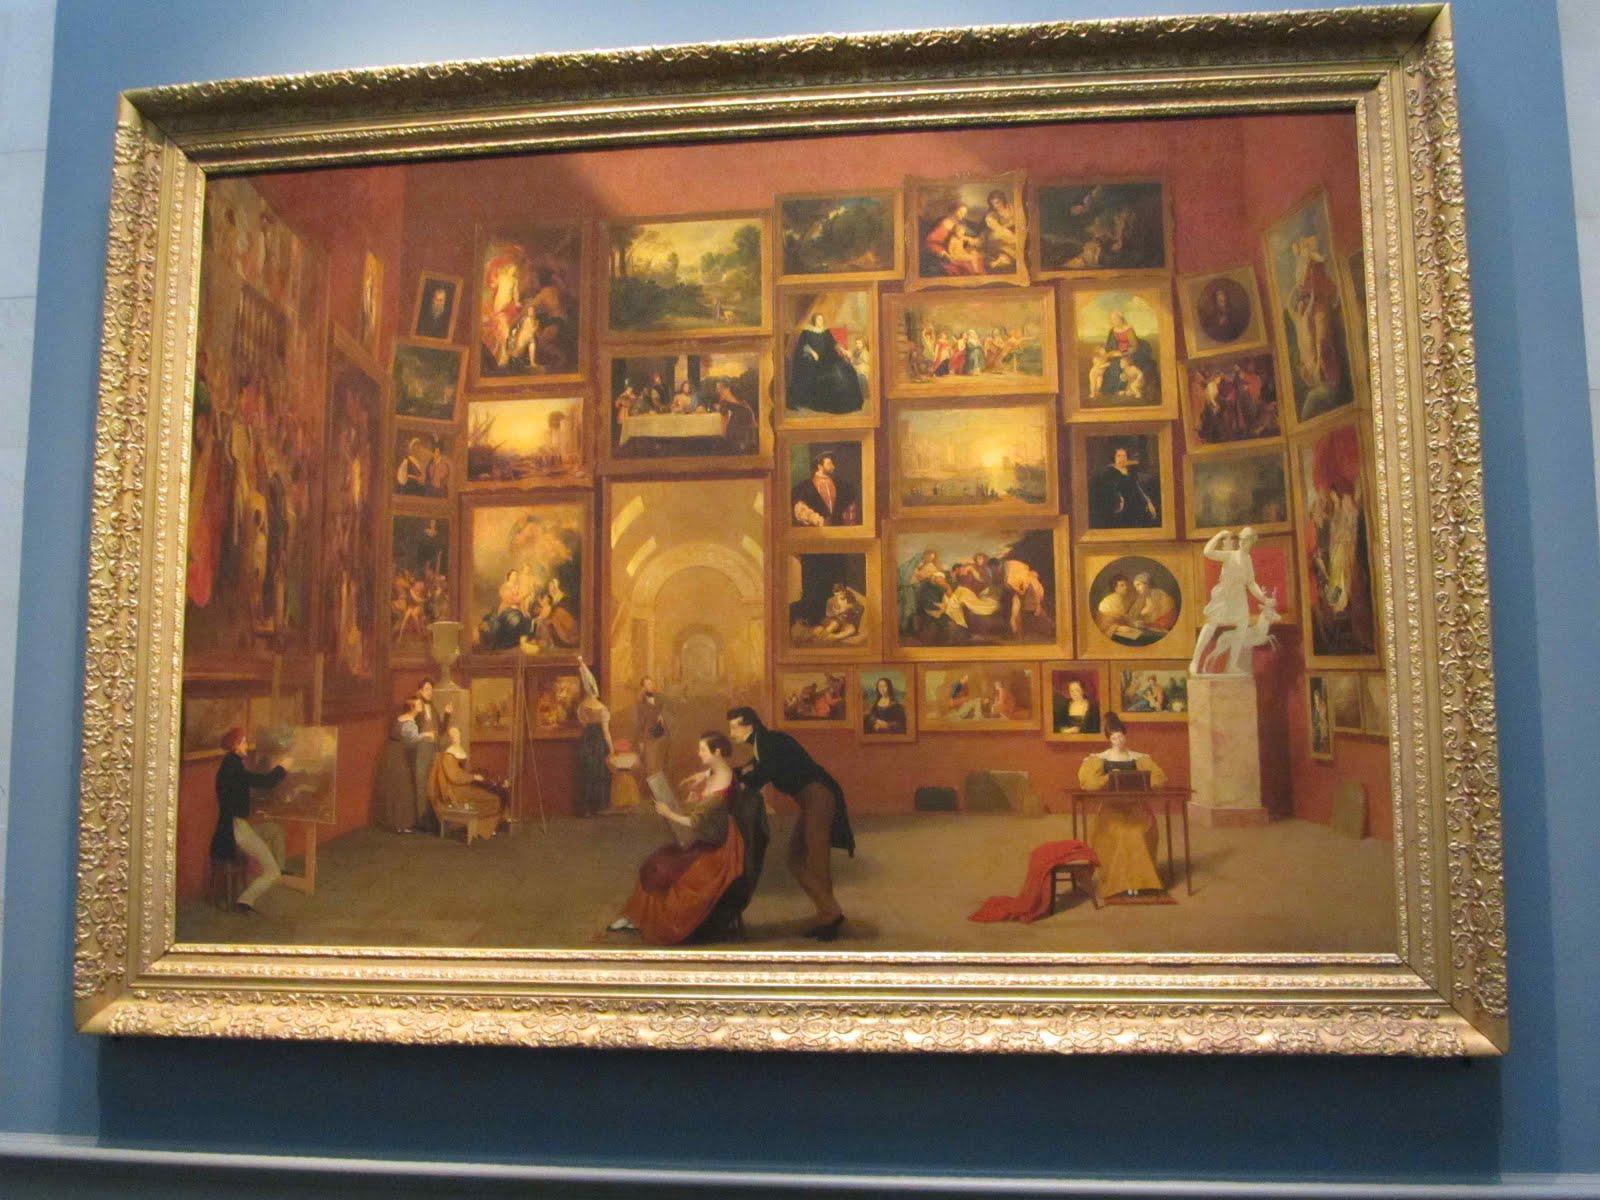 Mae Travels: Samuel F.B. Morse at the Louvre